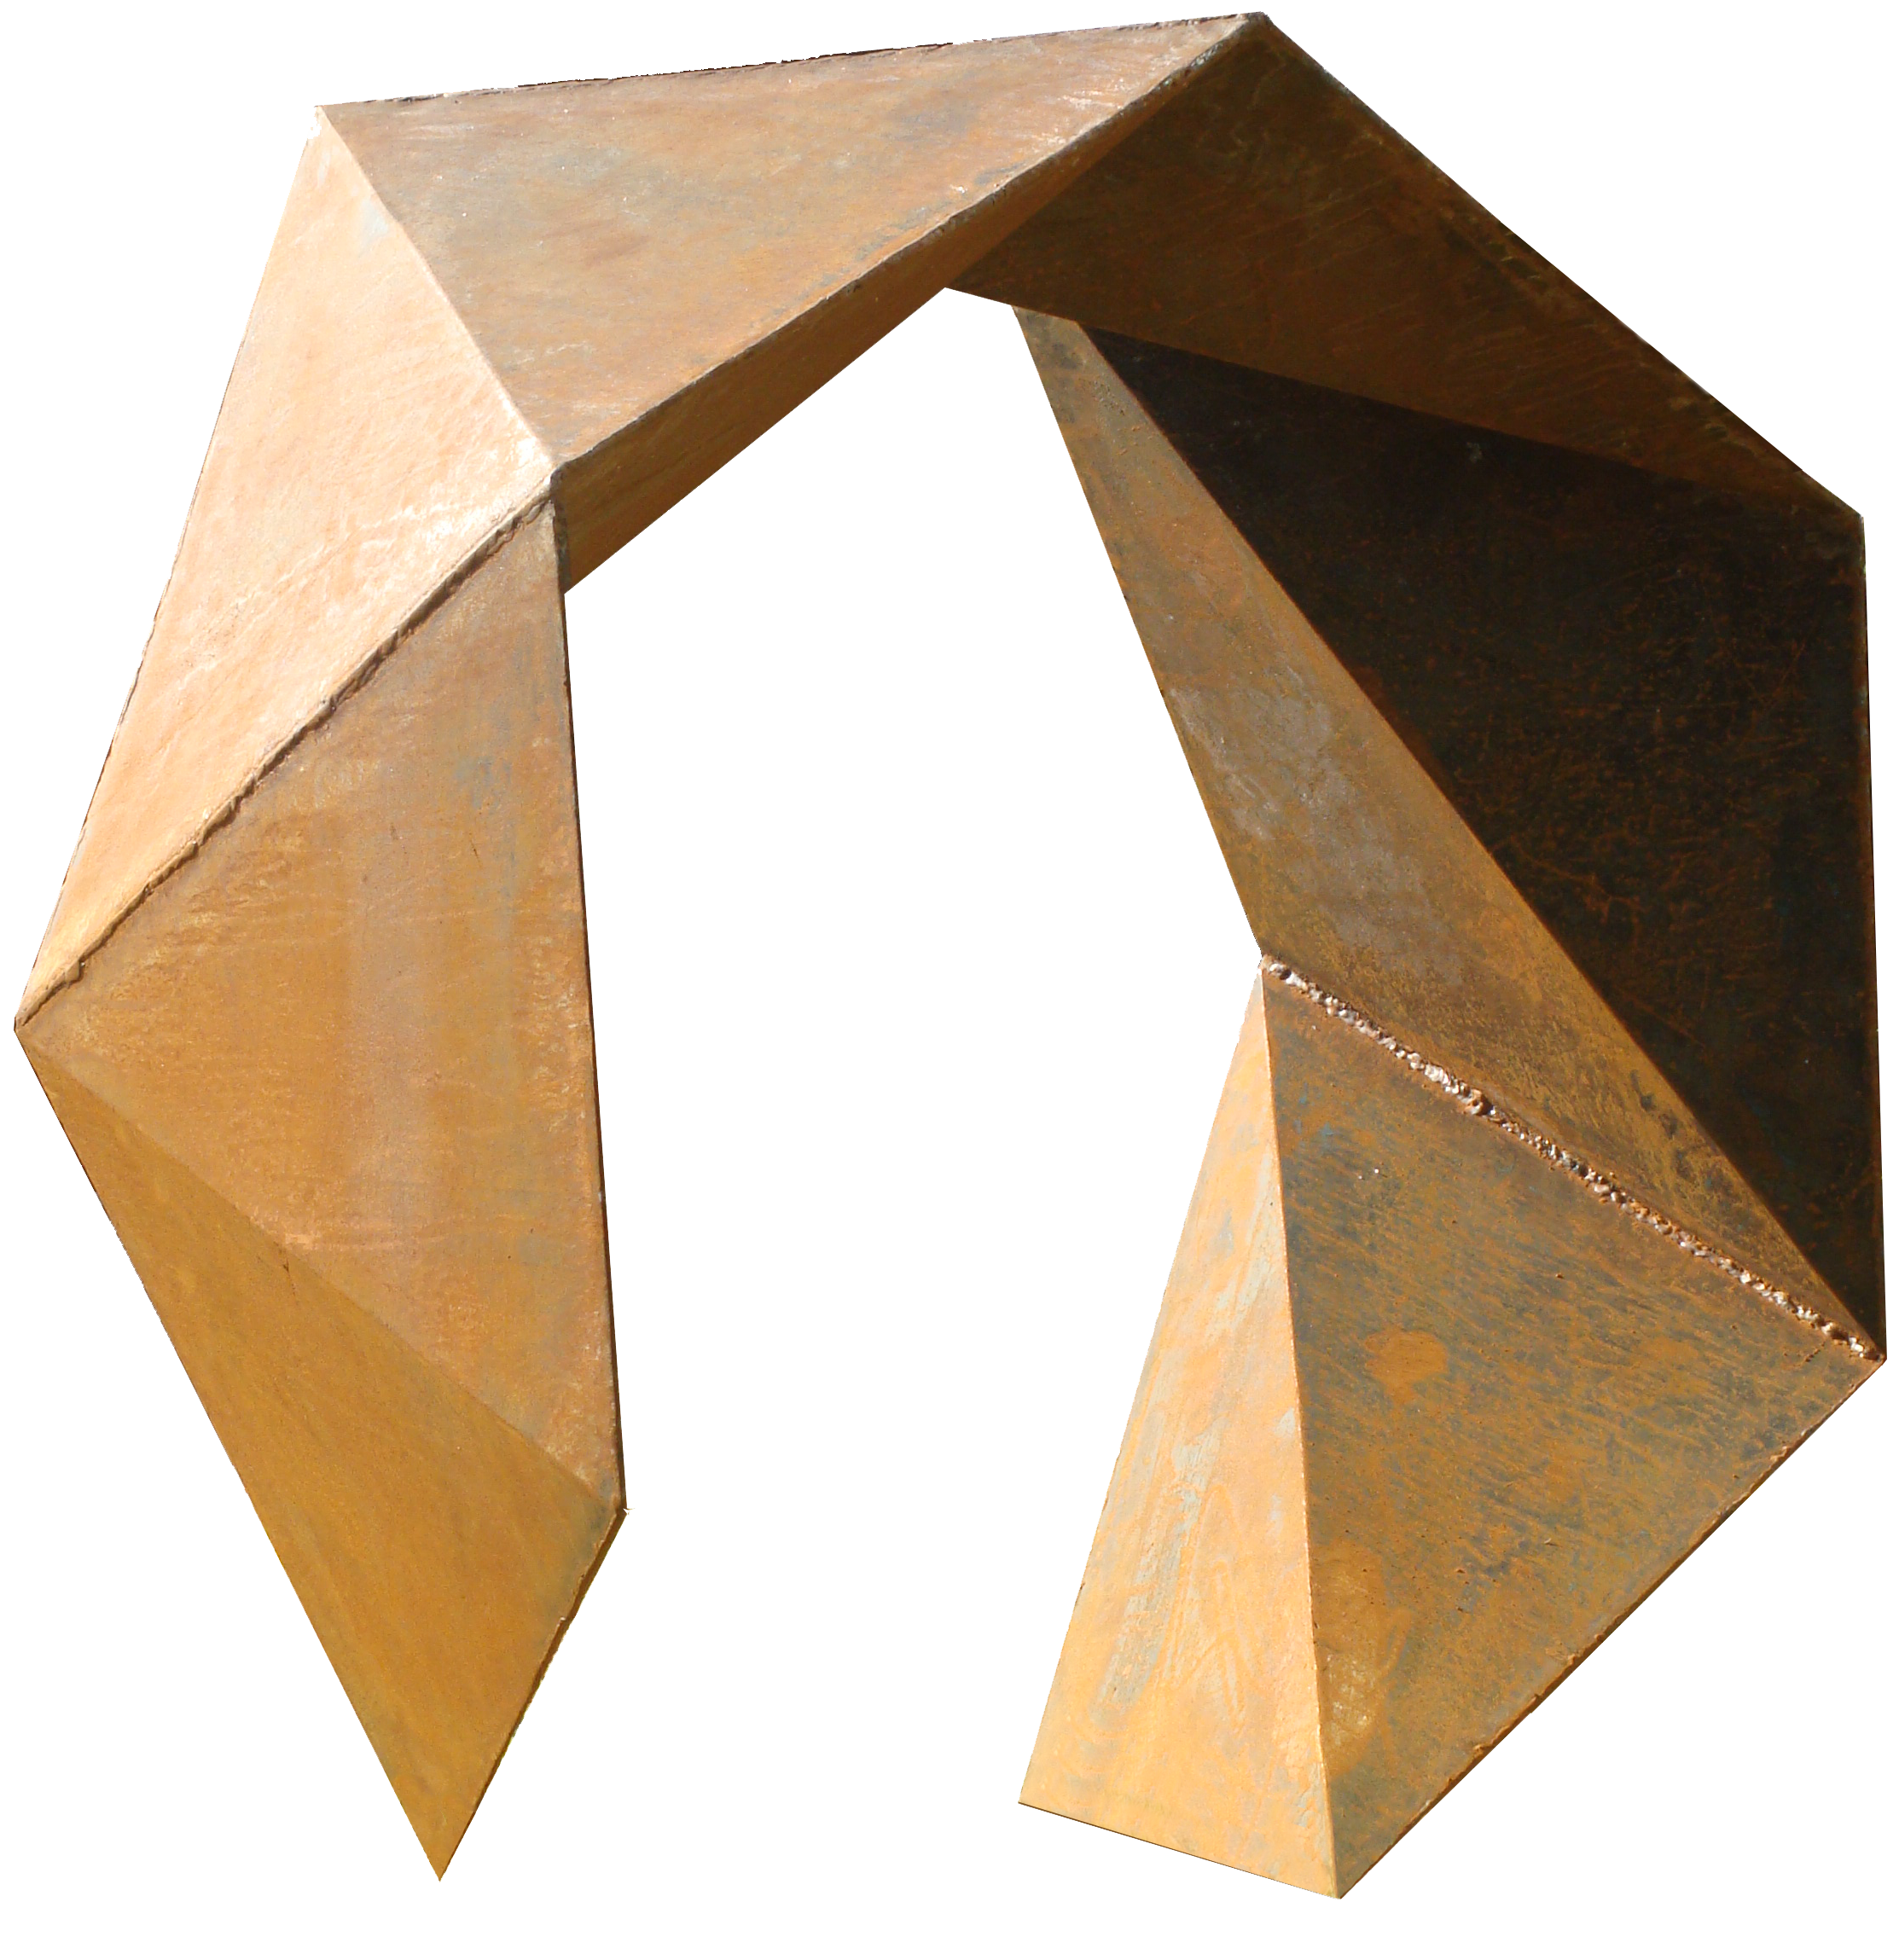 Gilberto Lustosa  Sólido aberto 6 lados,chapa de aço, 90 x 90 x 45 cm, 2011